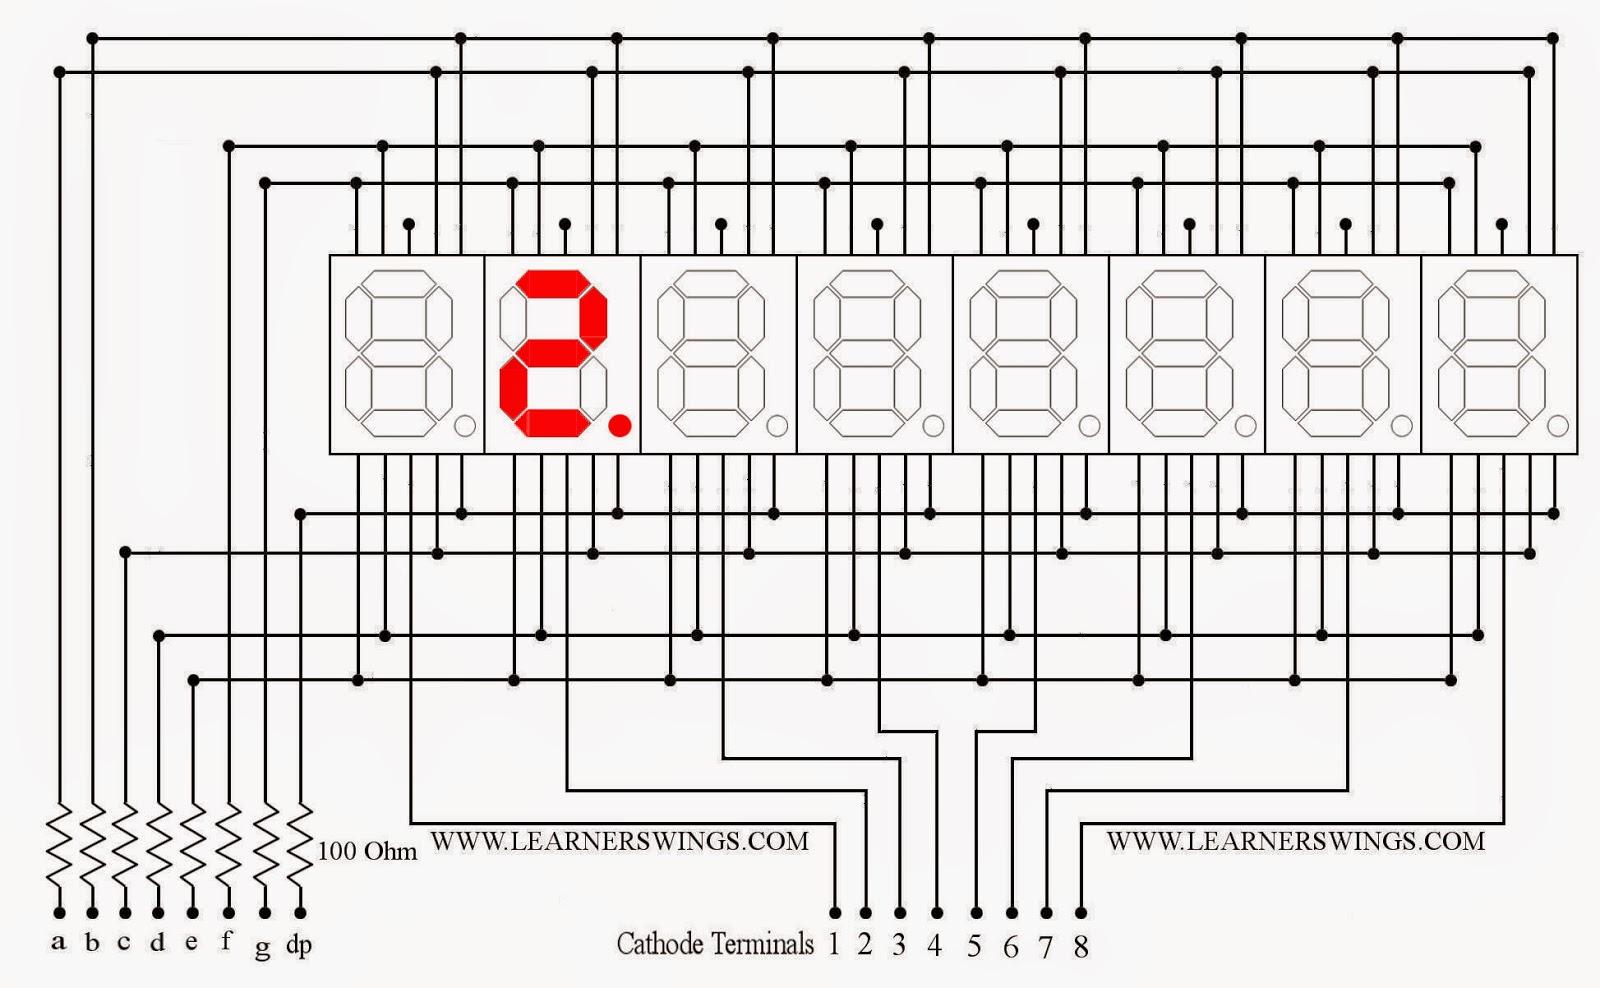 Program To Display In 8 Seven Segment Displays